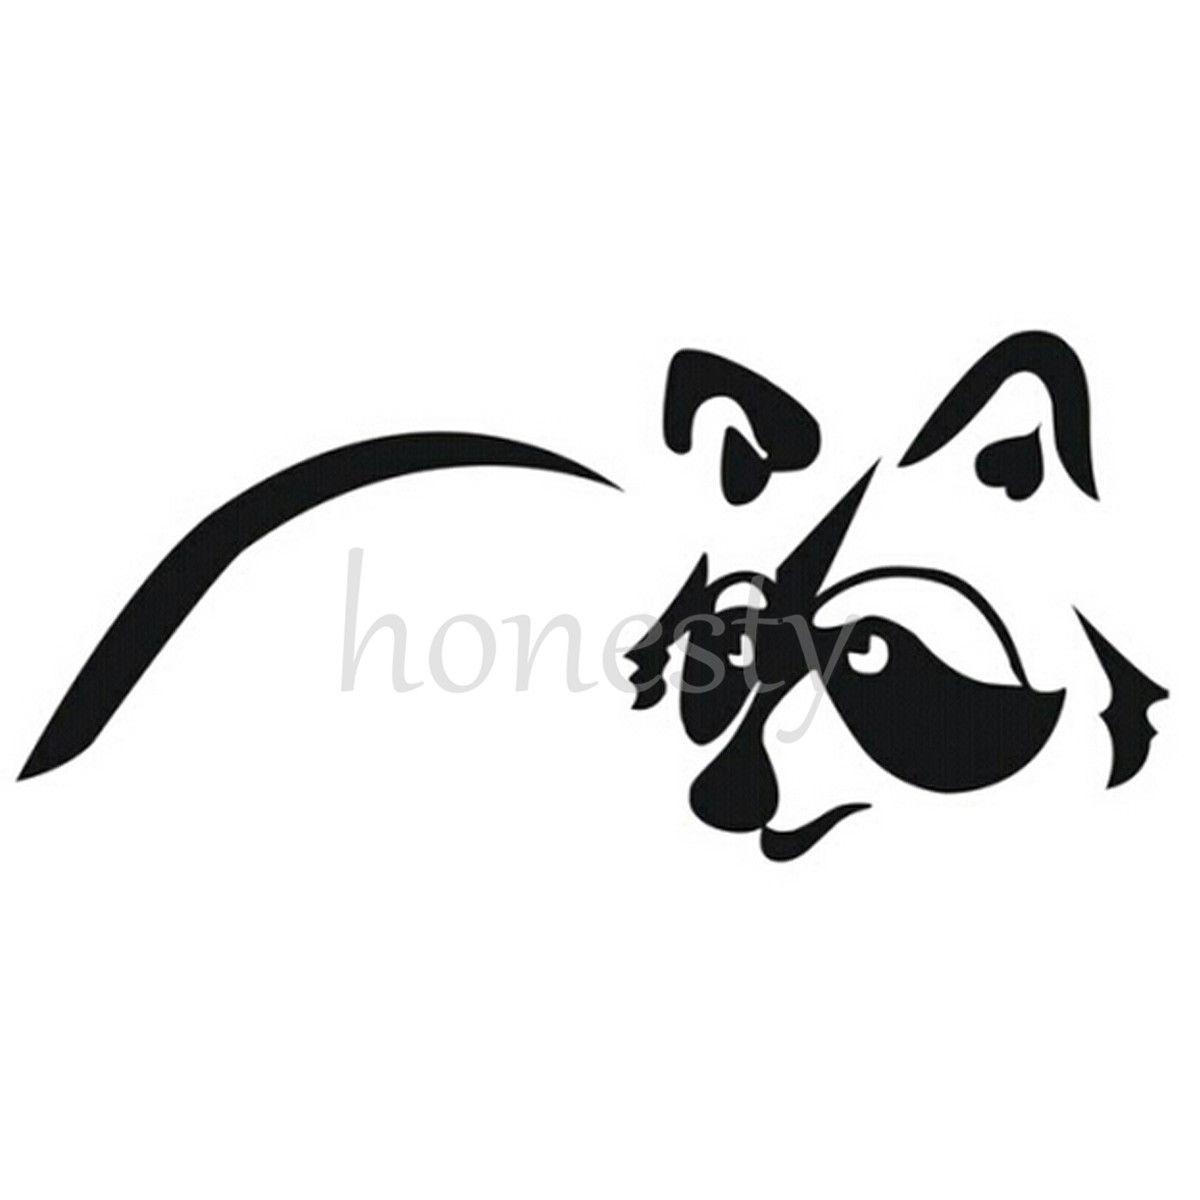 Online Buy Grosir Fox Stiker From China Fox Stiker Penjual